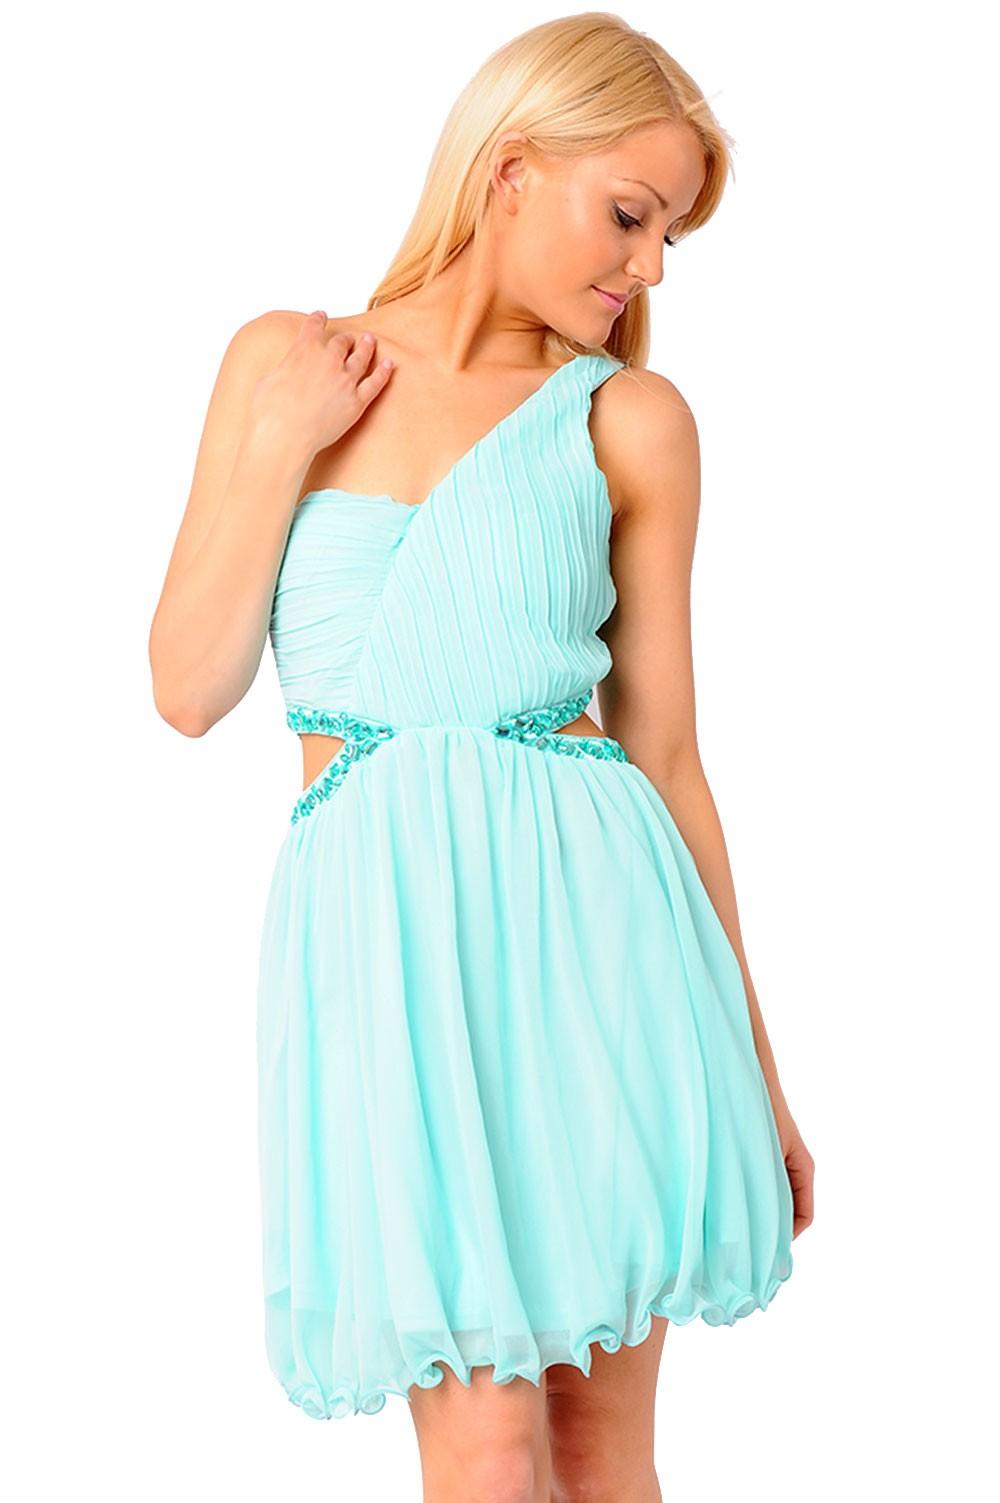 AX Paris Jules One Shoulder Cut Out Waist Dress   iCLOTHING